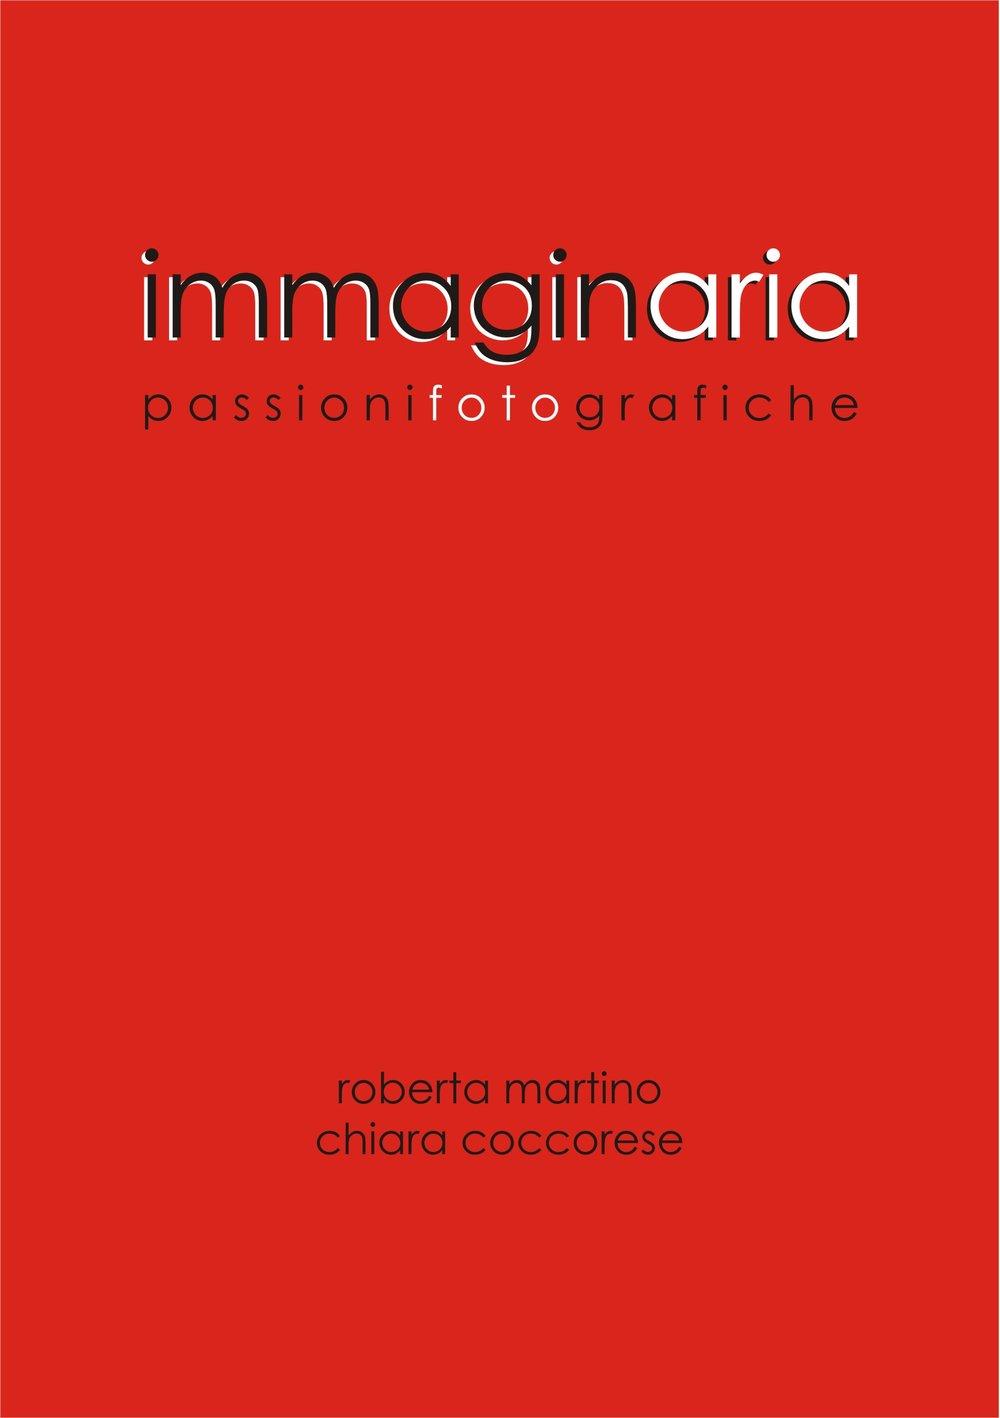 Immaginaria_RAVELLO.jpg